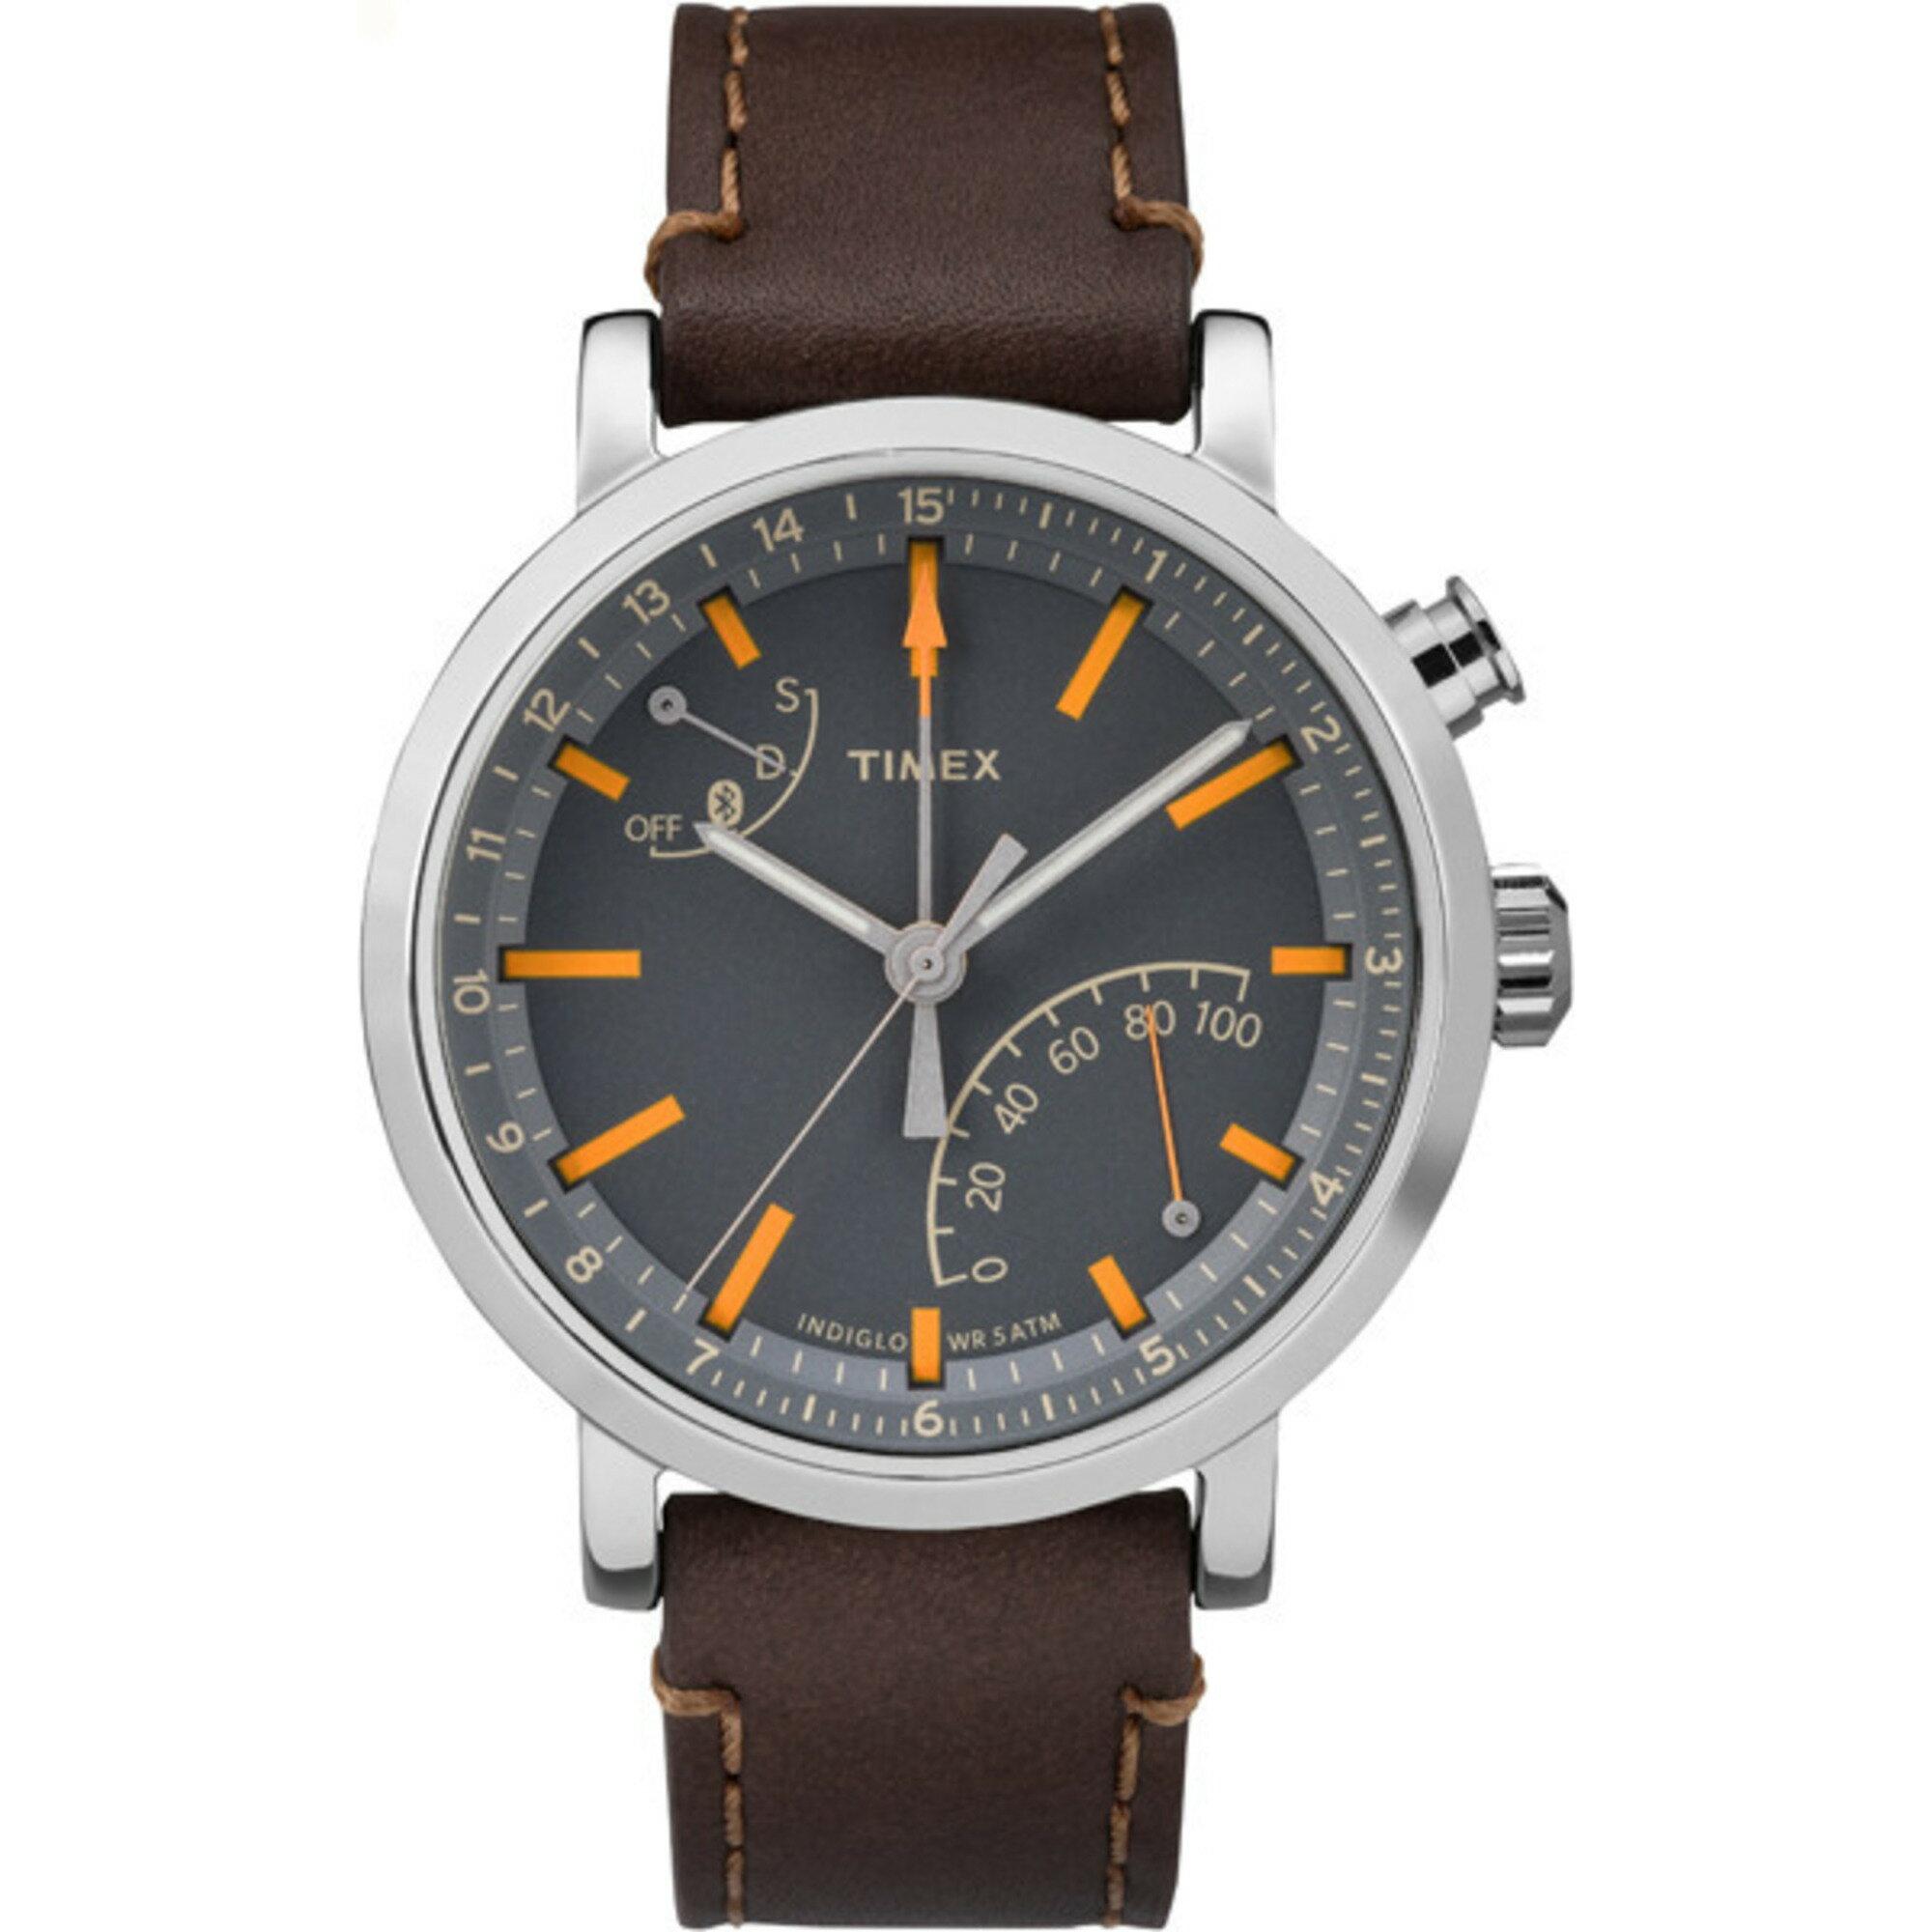 306c986734c Timex Metropolitan+ - Analog Activity Tracker Watch Leather Grey Dial  TW2P92300 0